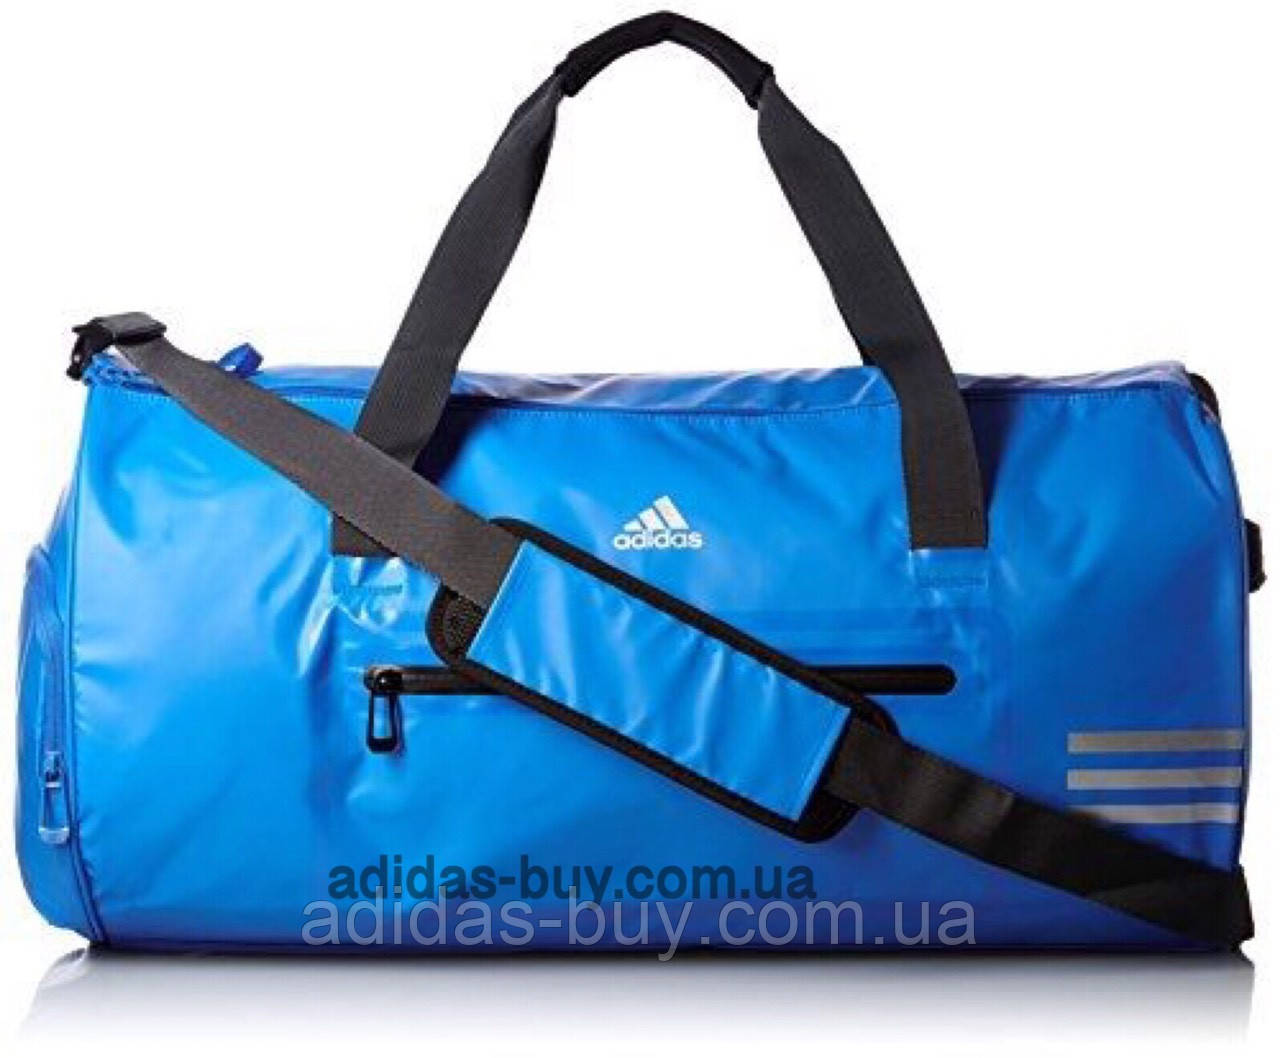 a76d9fc4ac61 Спортивная дорожная сумка adidas climacool AJ9738 цвет: синий: 1 190 ...